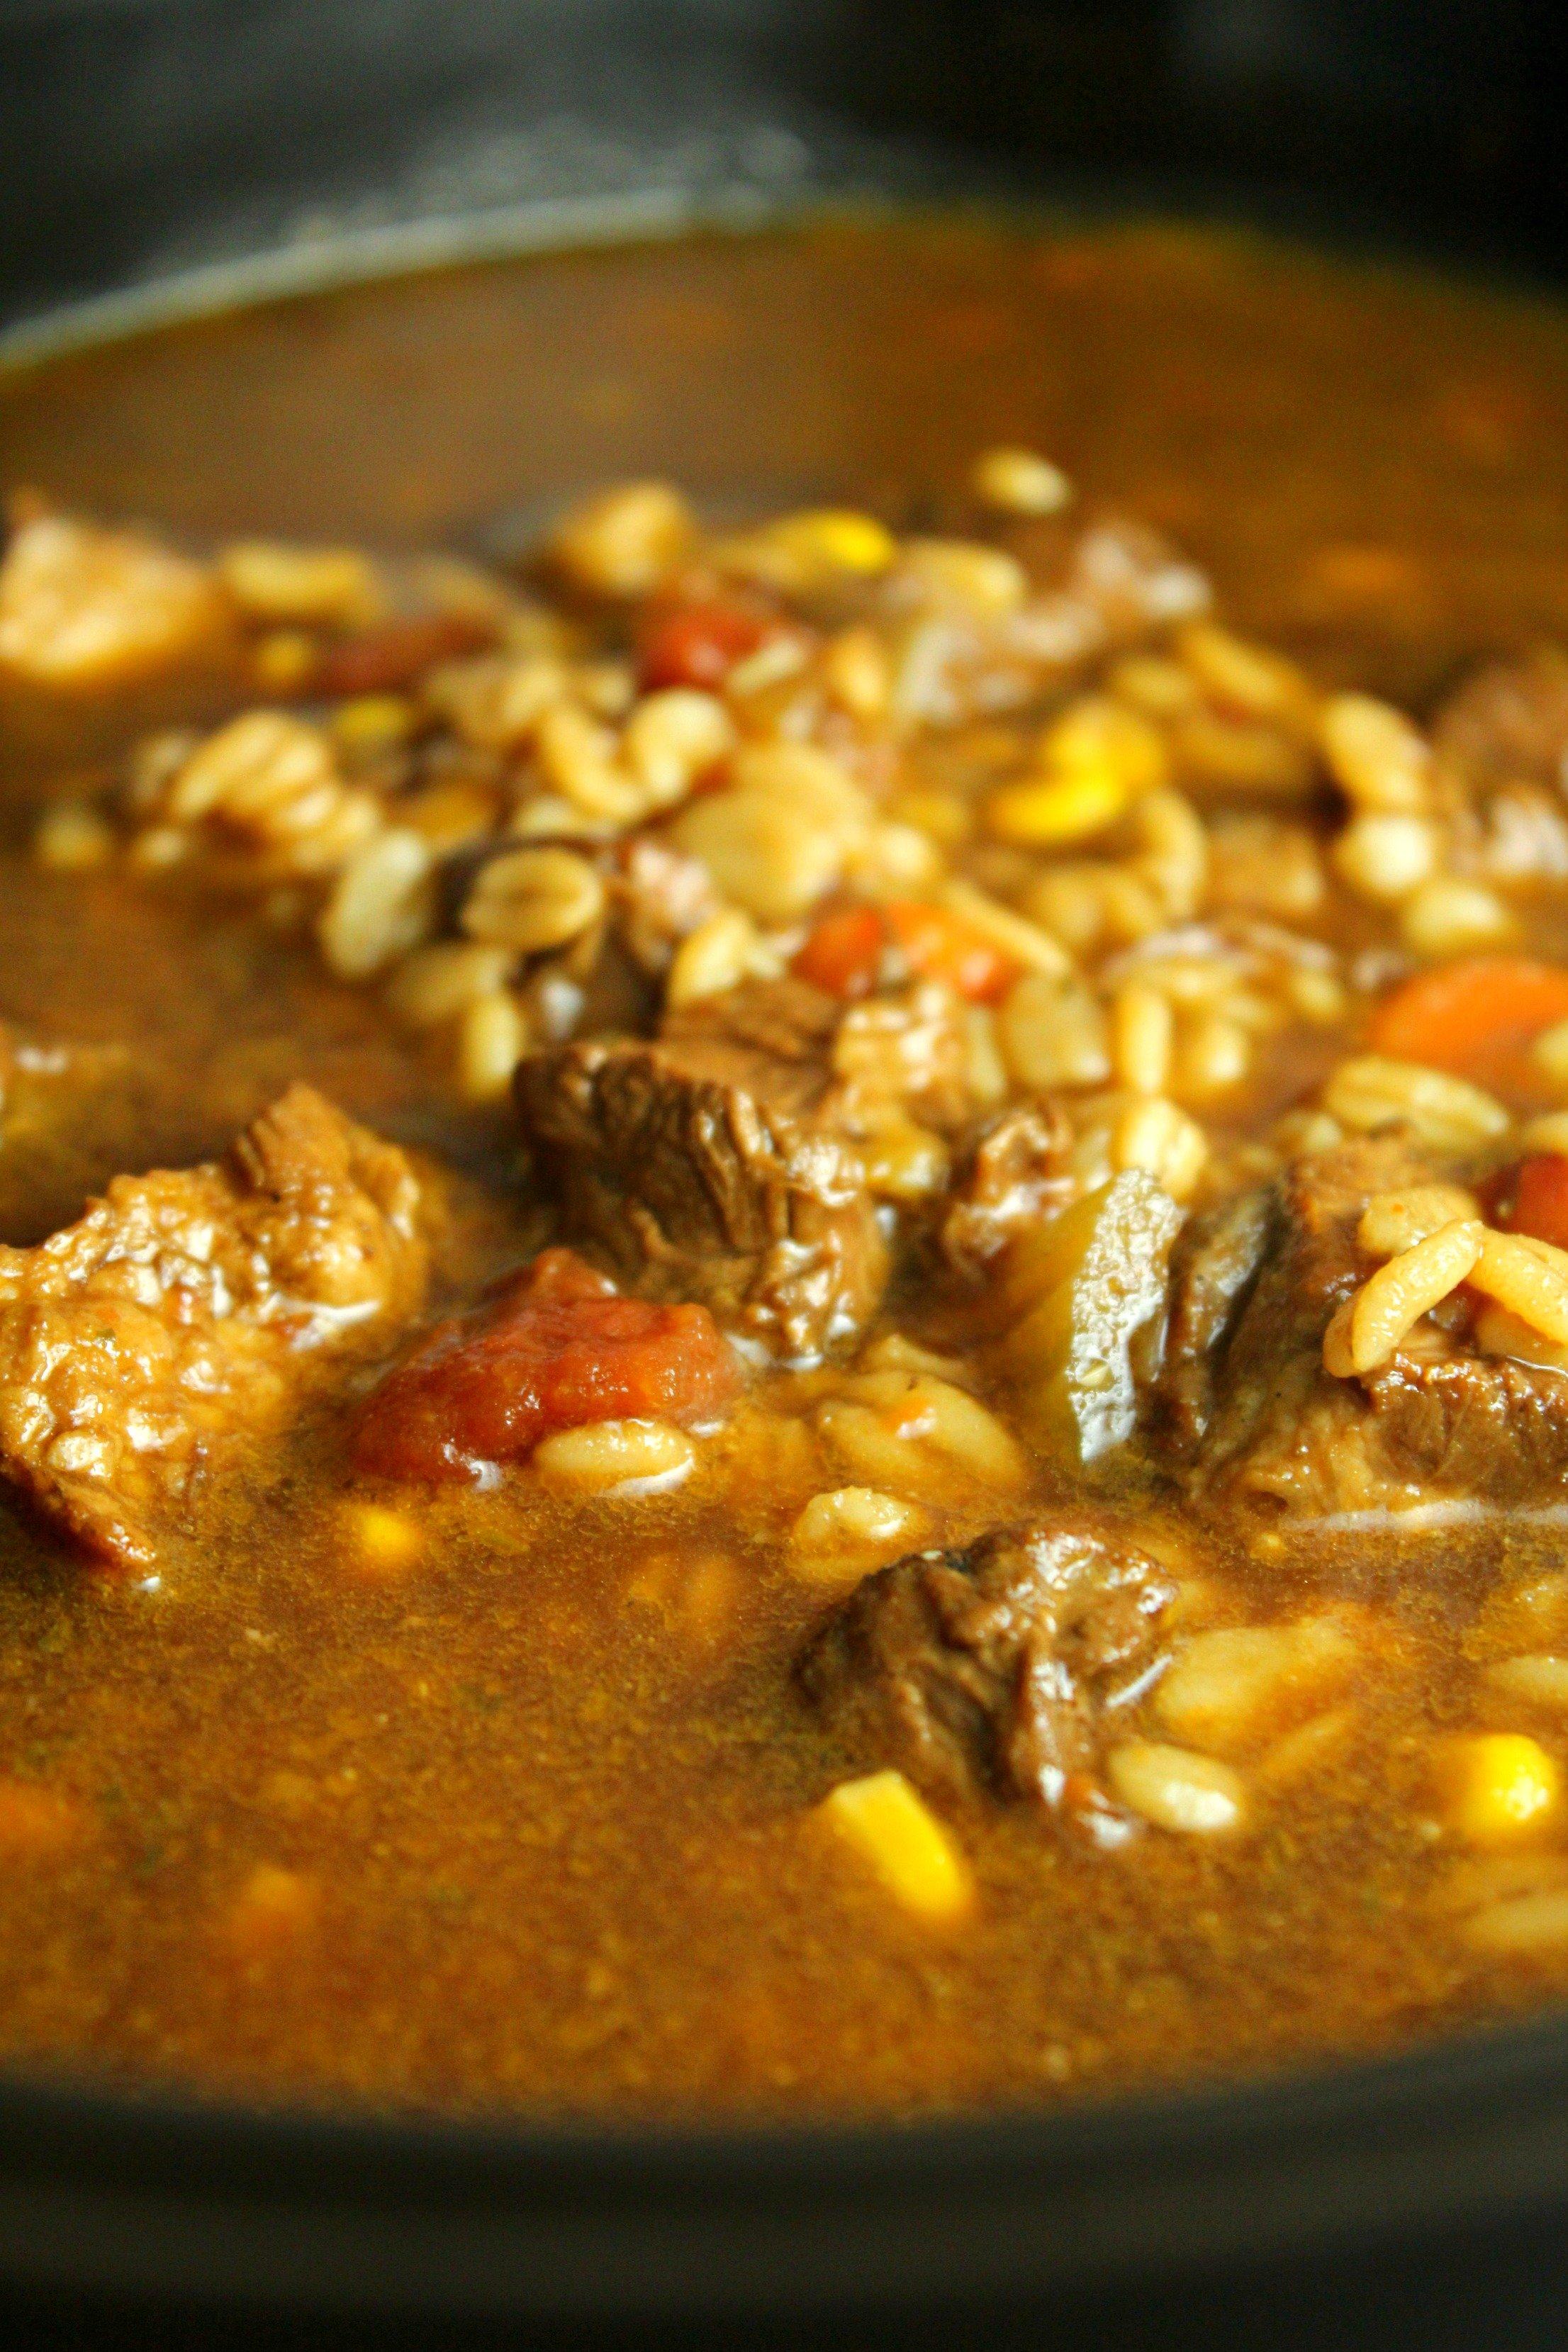 Homemade Slow Cooker Beef Amp Barley Soup